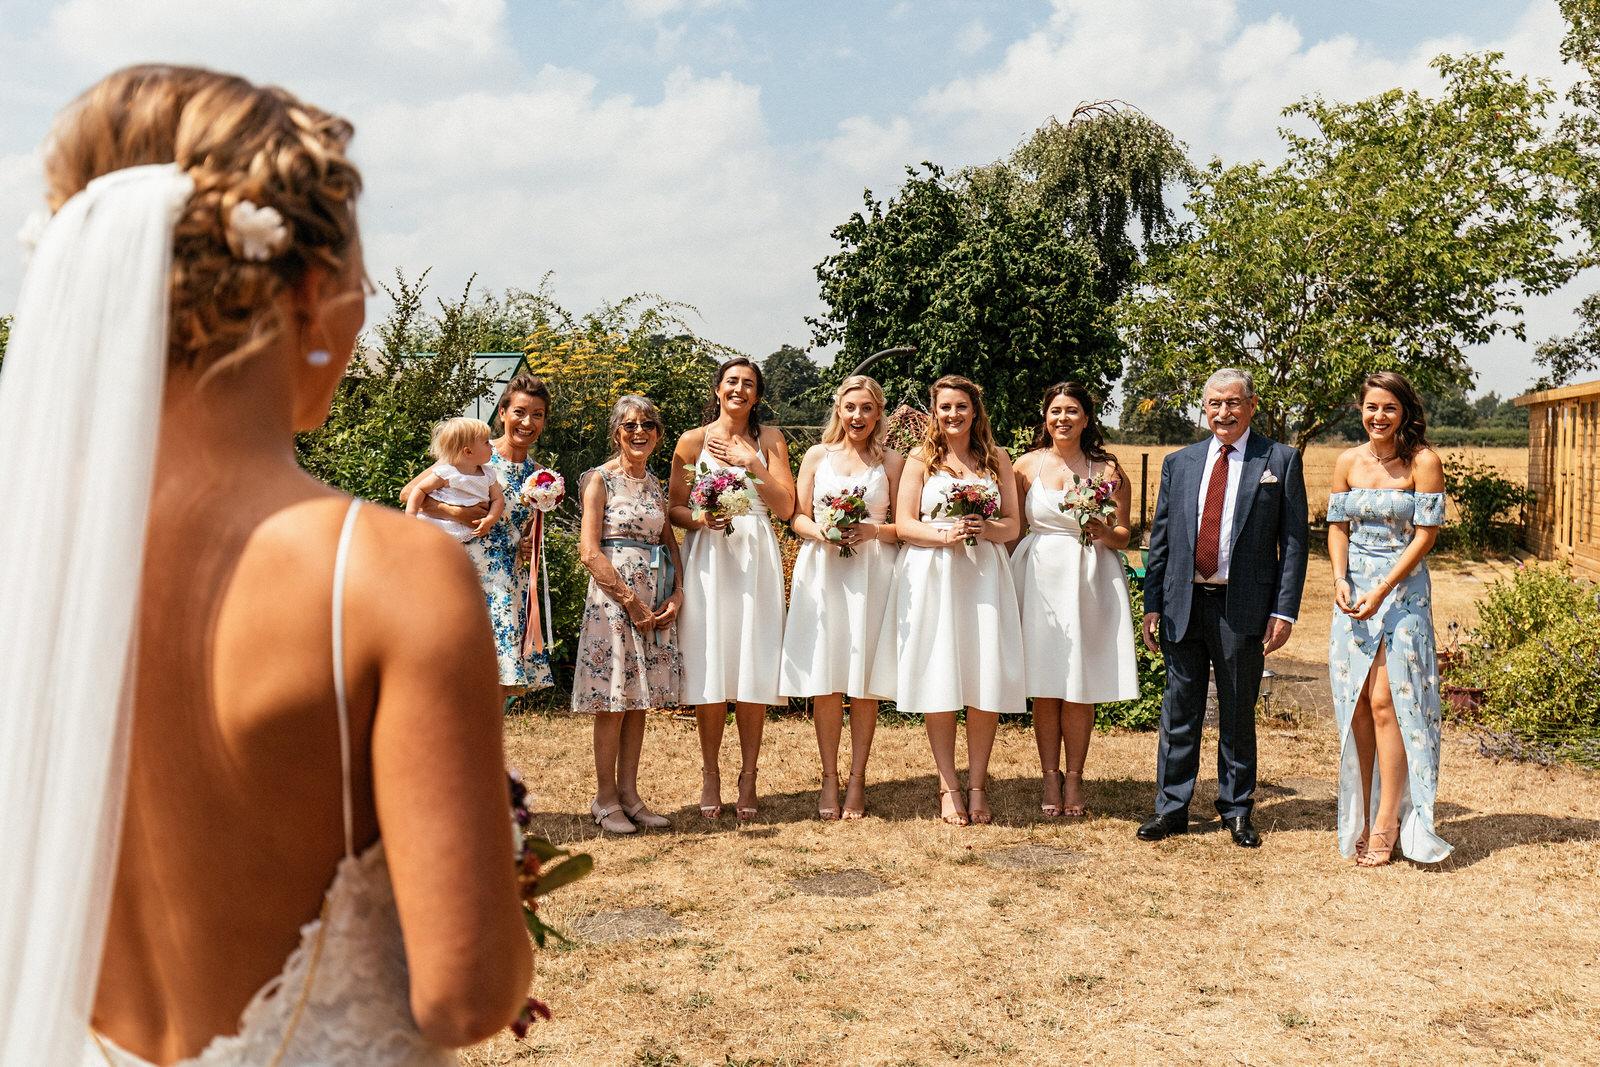 Edworth-Manor-Farm-Wedding-Photographer-009.jpg